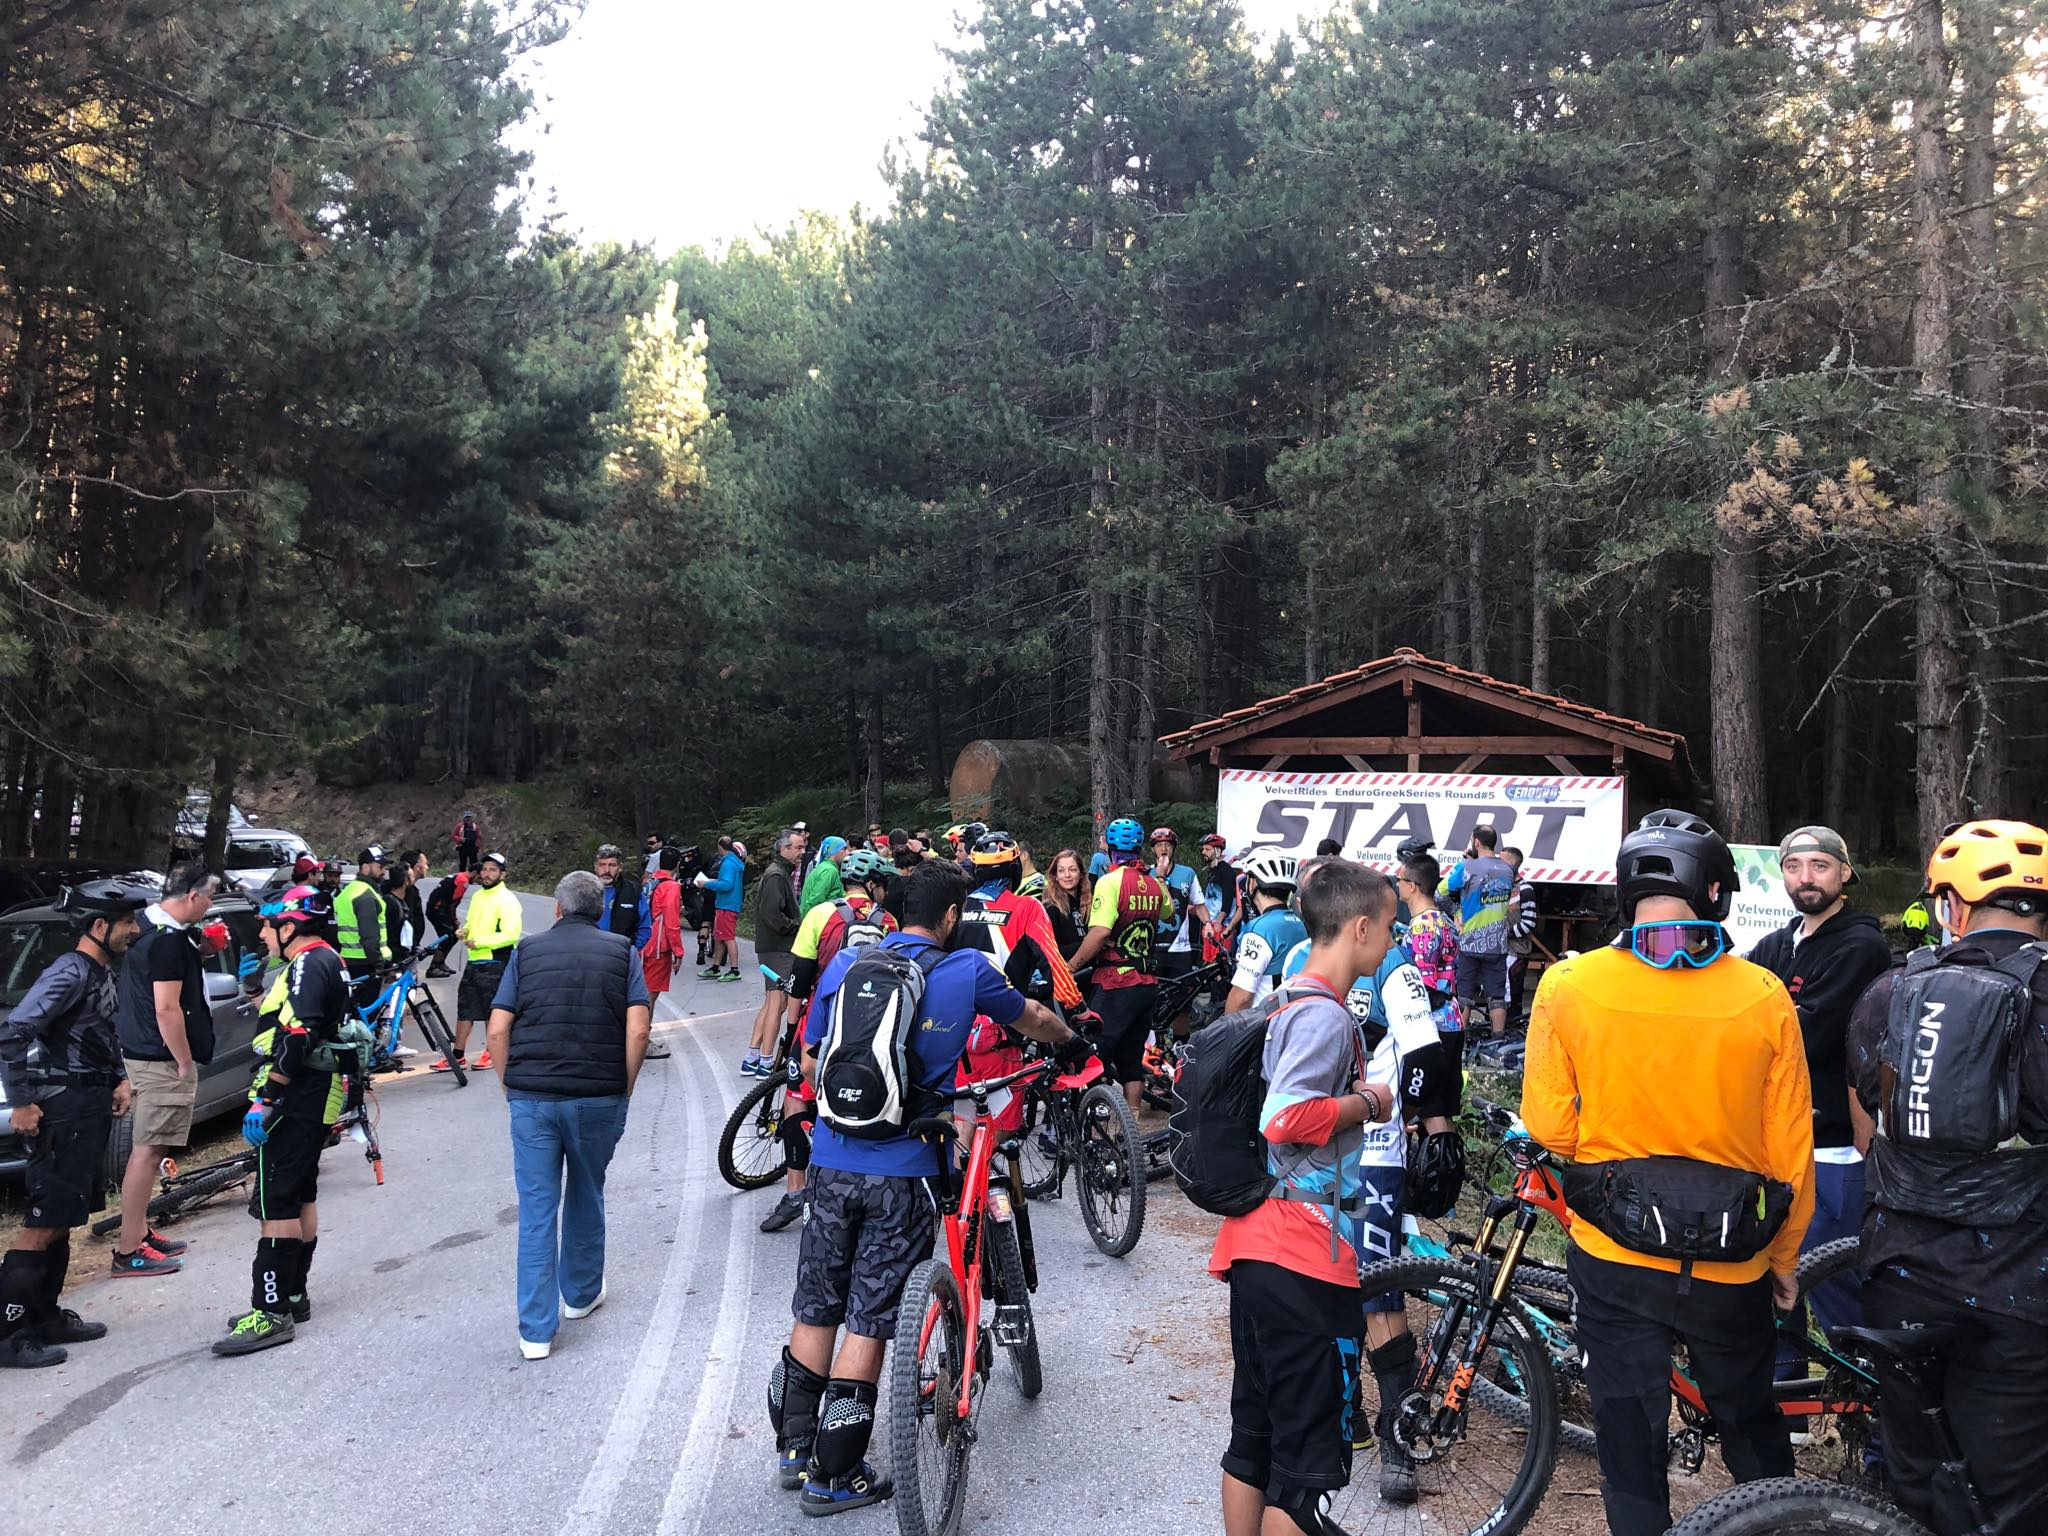 kozan.gr: Γέμισε ποδηλάτες, το πρωί της Κυριακής 15/9, το Βελβεντό, για το VelvetRides Enduro – 5ο γύρο του πρωταθλήματος ορεινής ποδηλασίας enduro MTB 2019 με ονομασία «Enduro Greek Series» (Βίντεο & Φωτογραφίες)